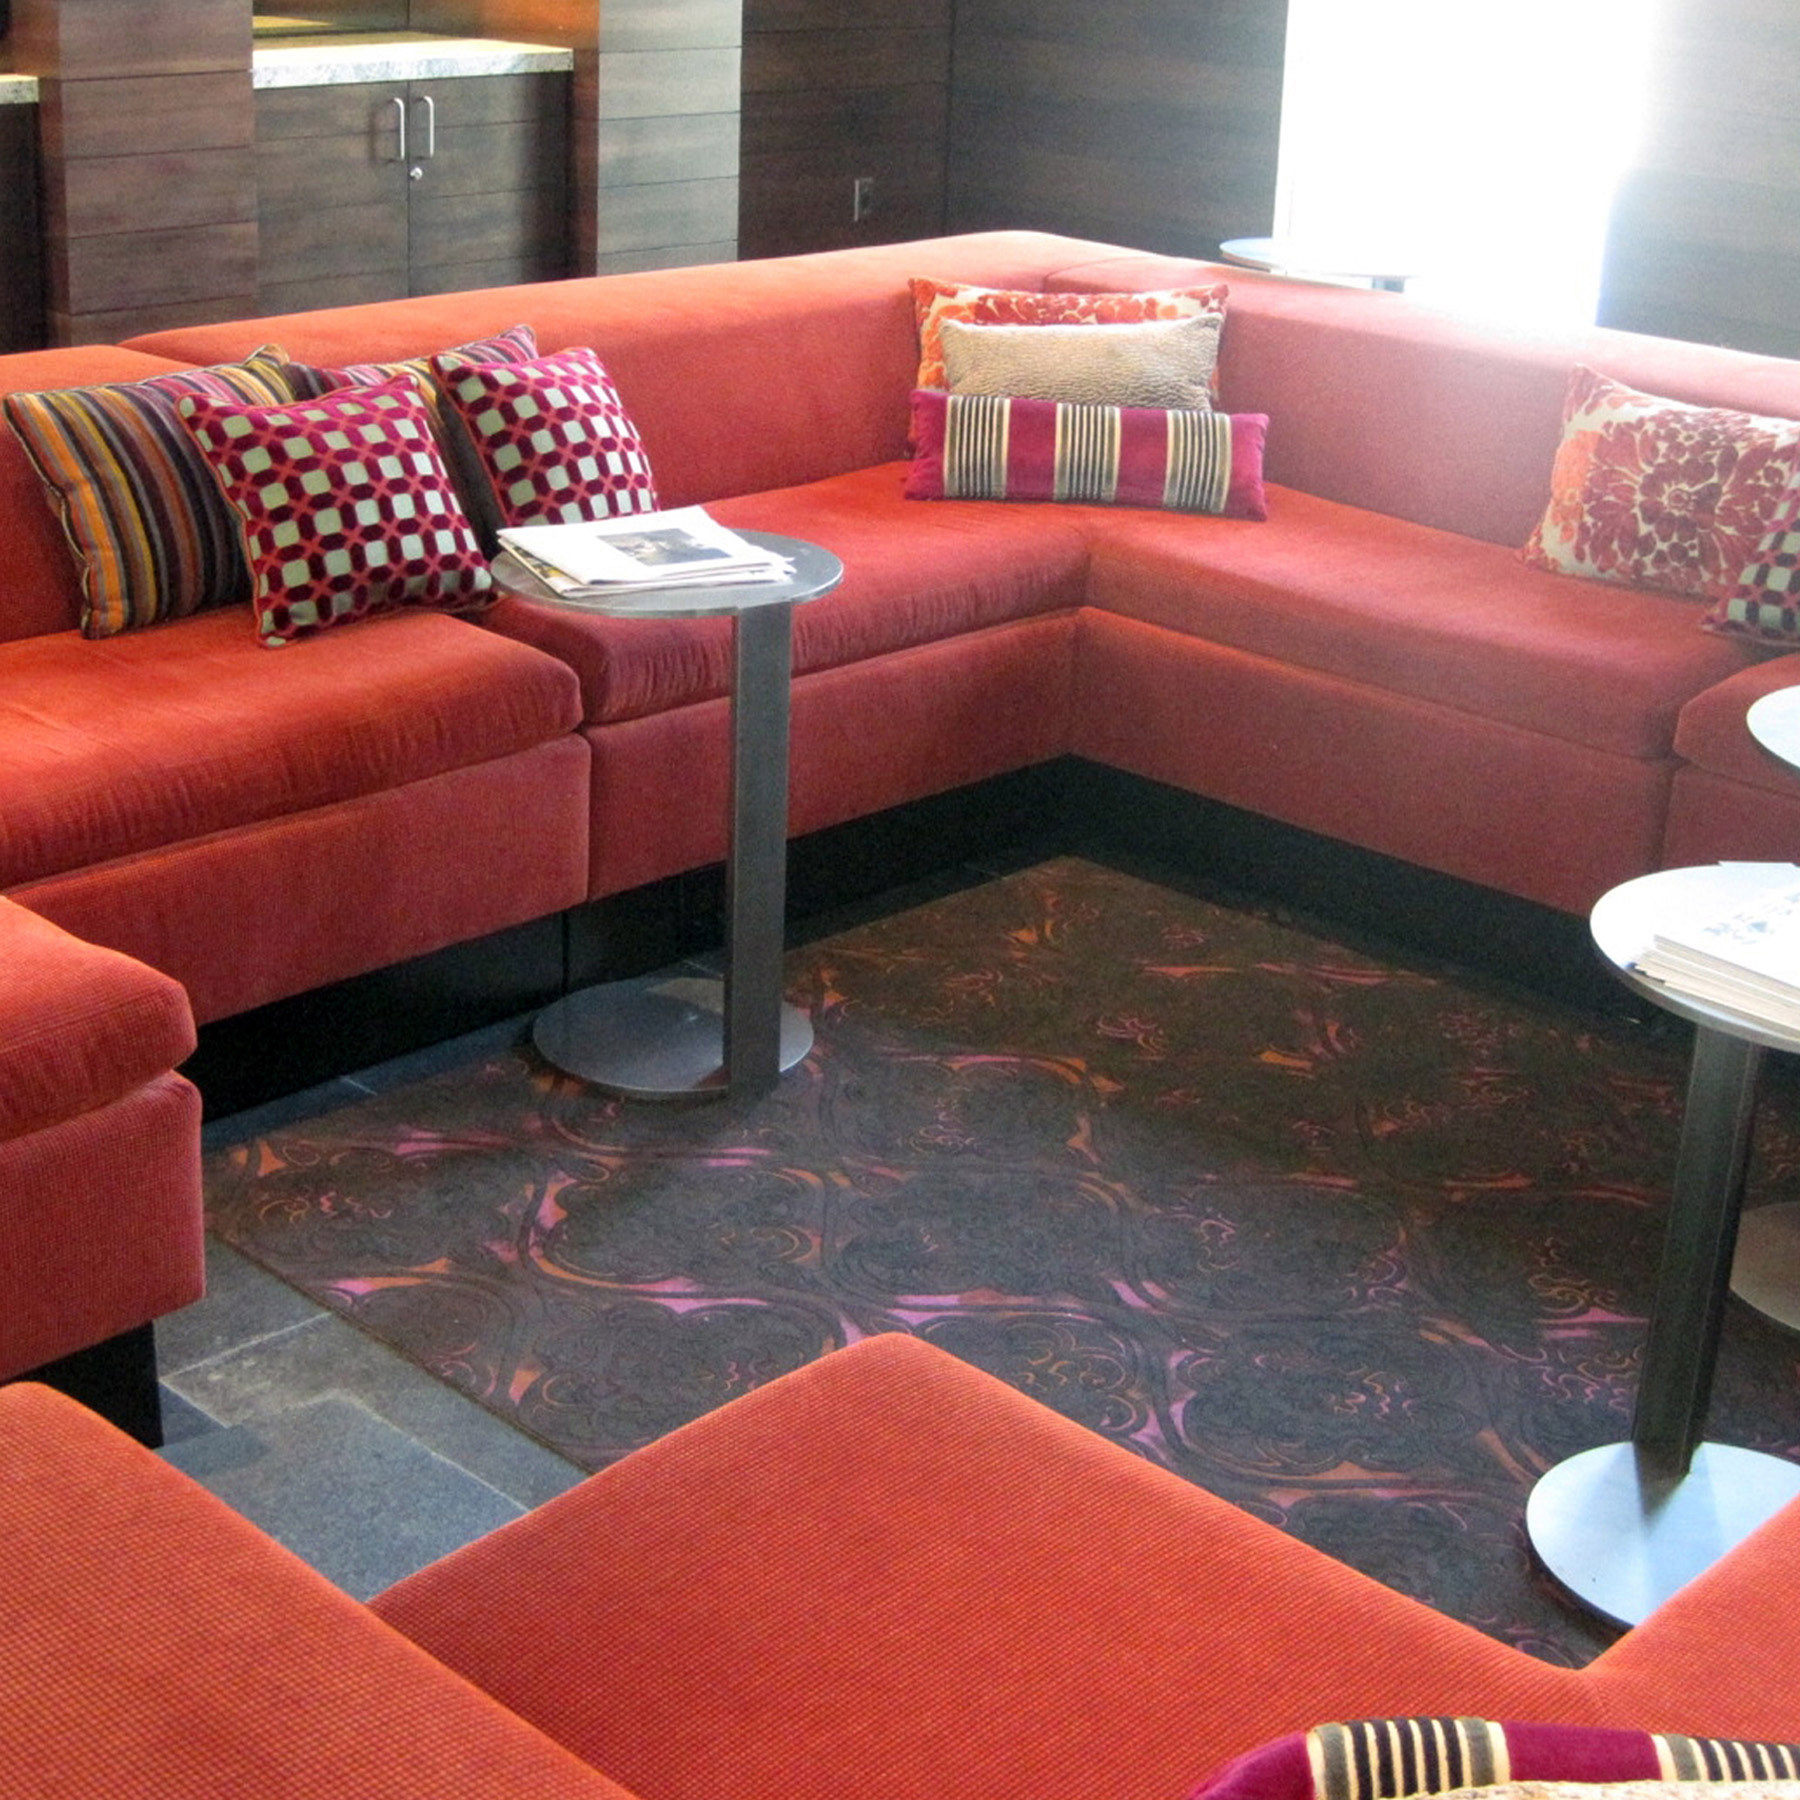 Hotel Lumen - Dallas, TX